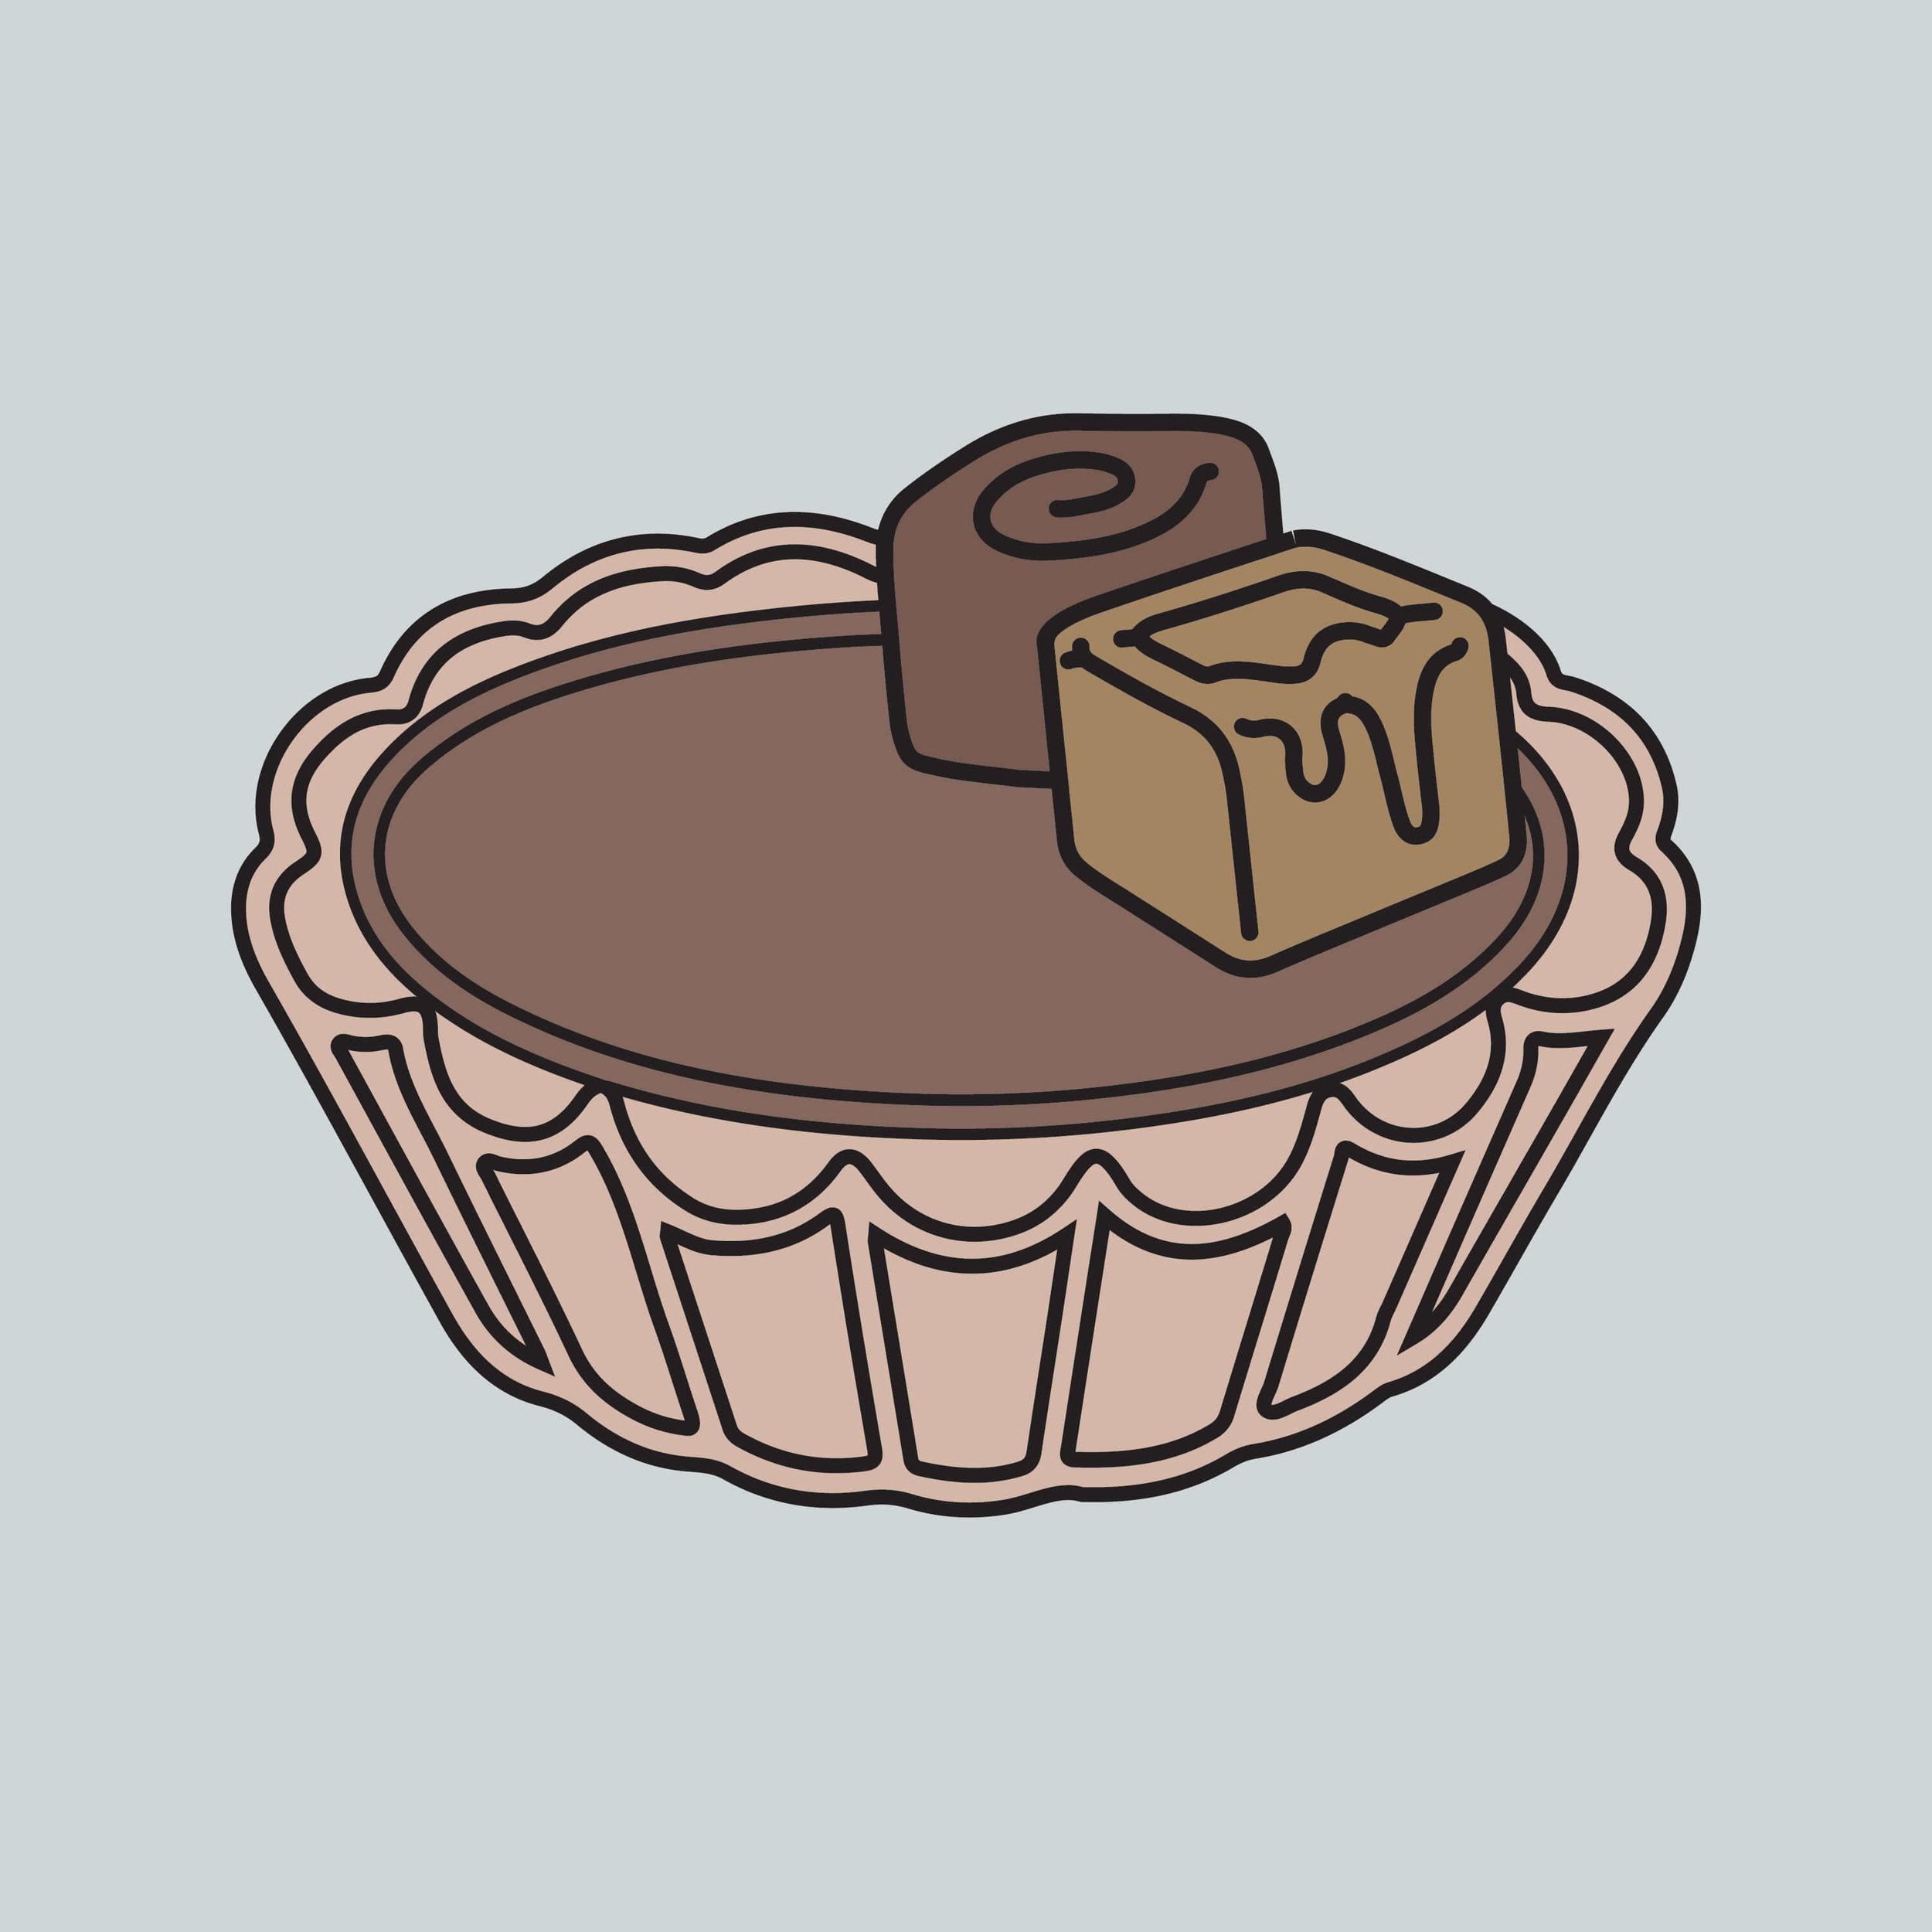 Chocolate Truffle Caramel